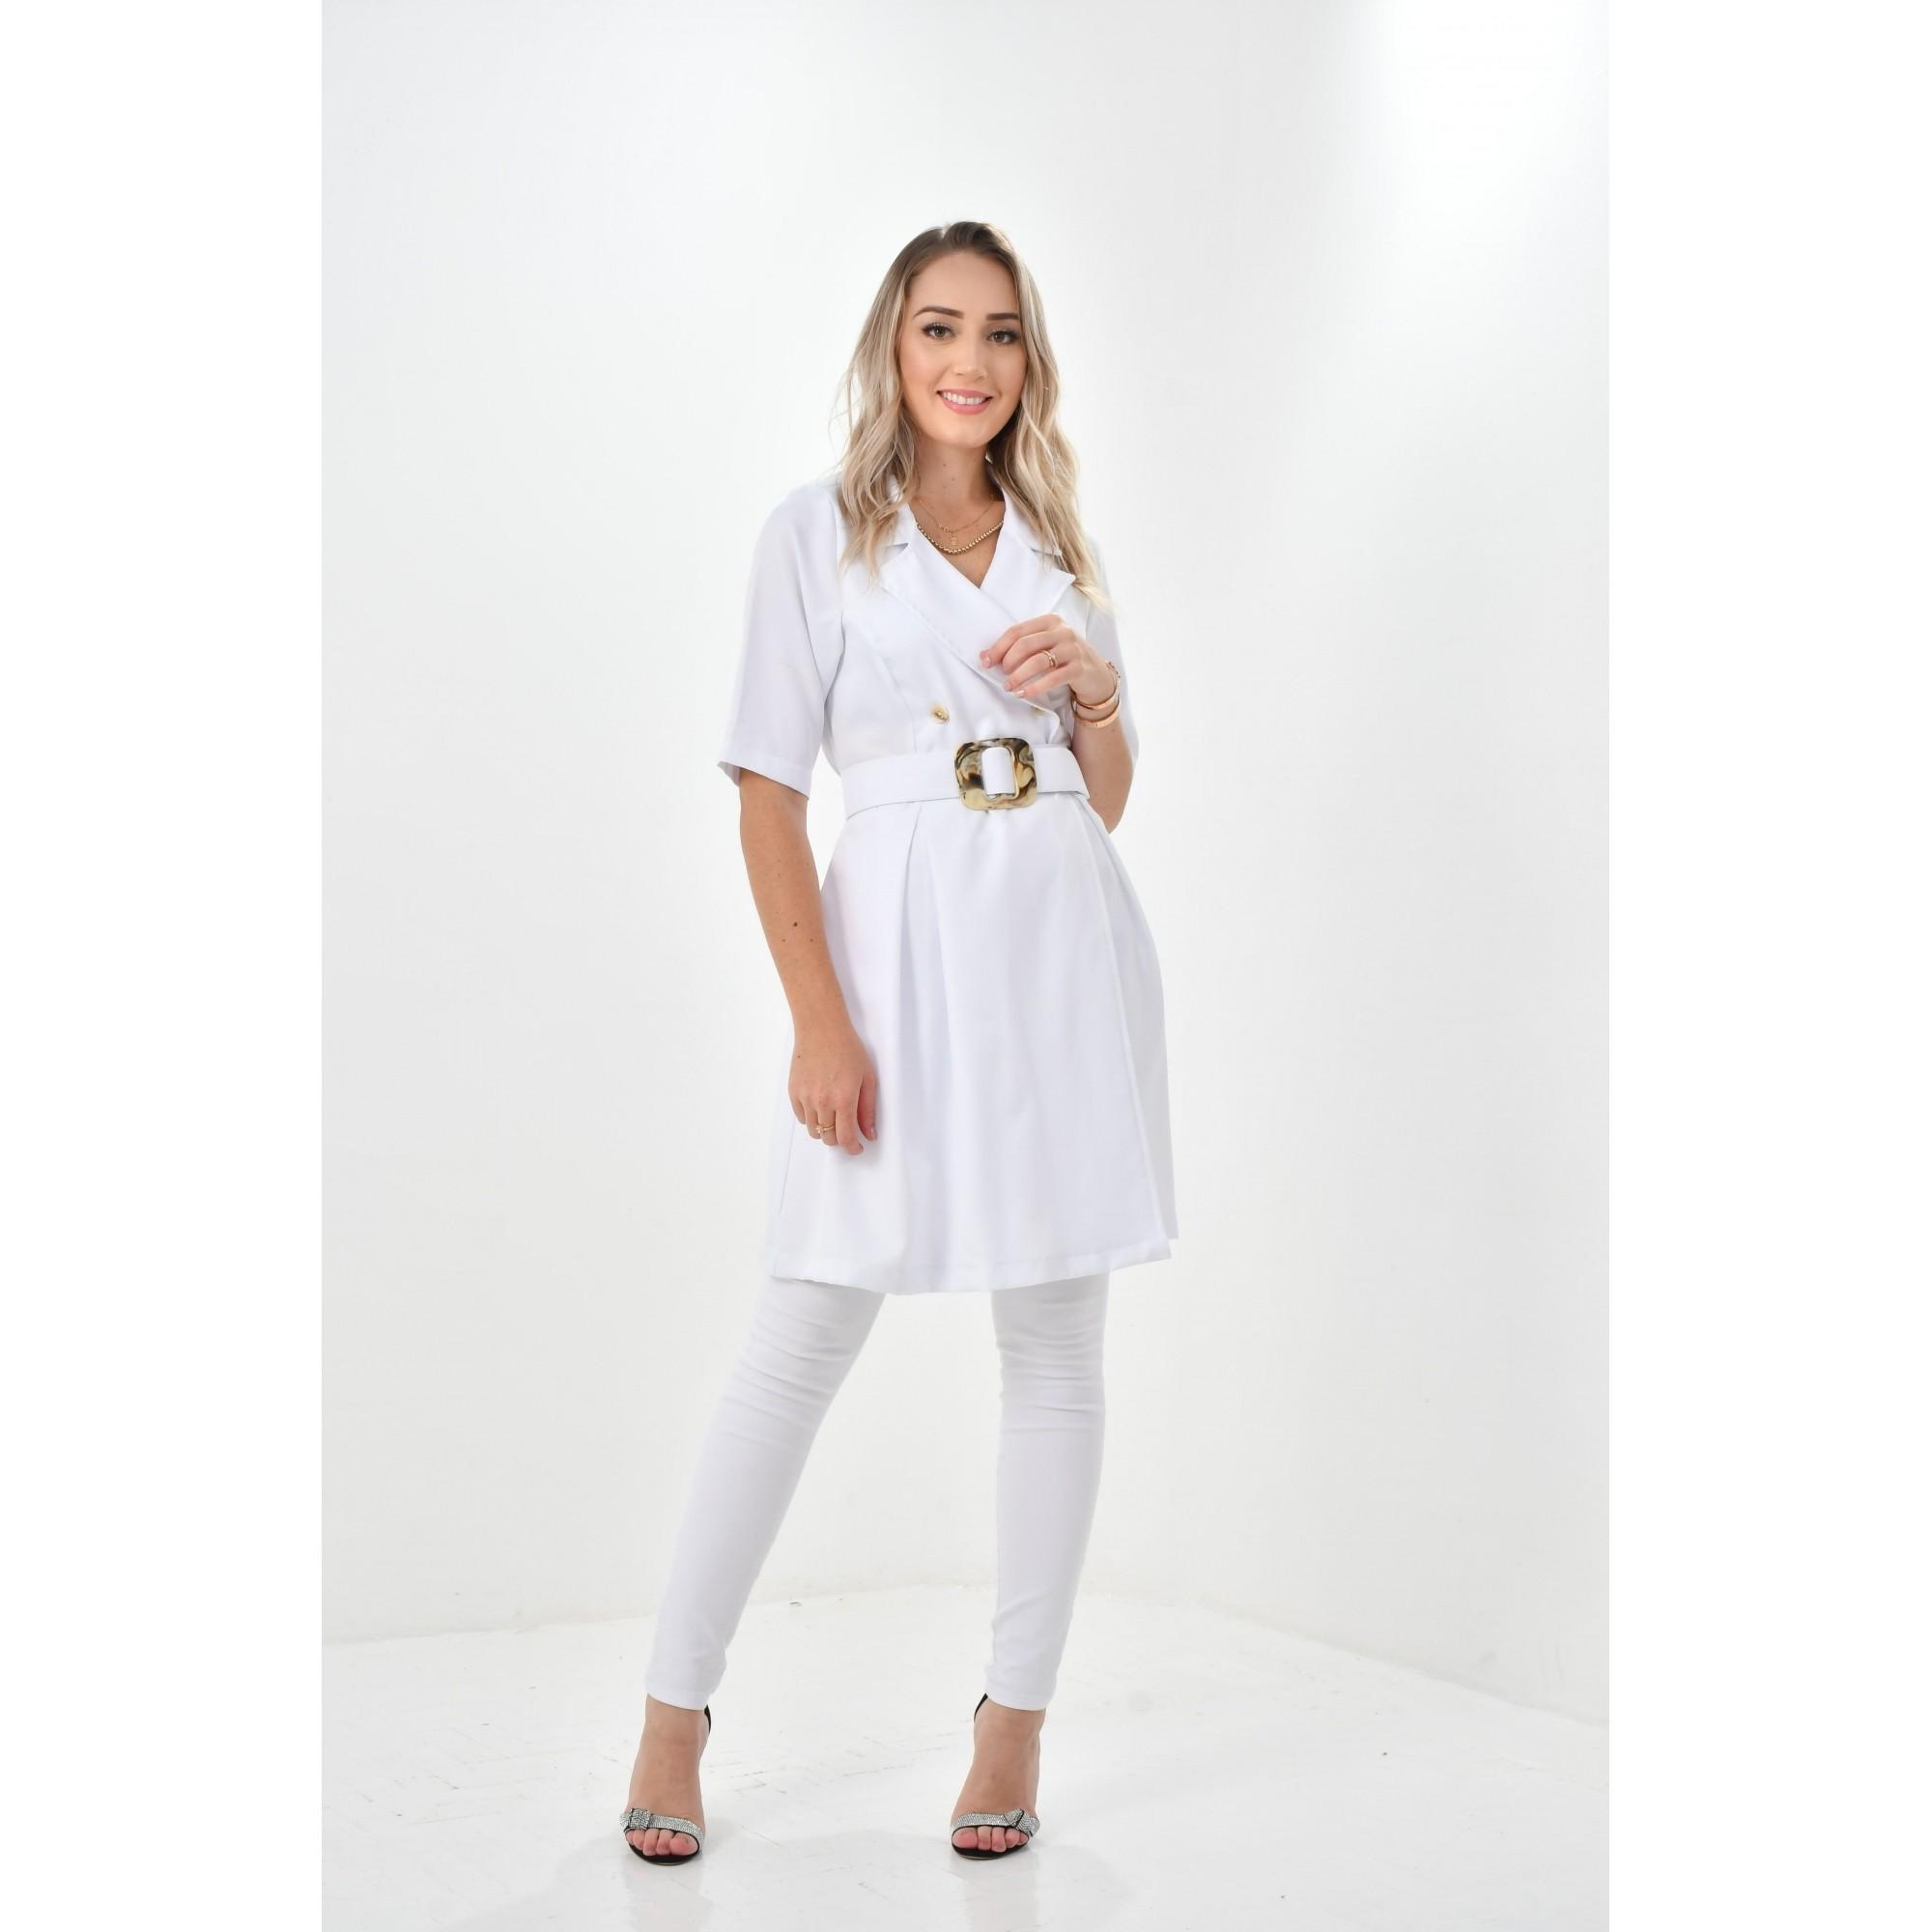 Jaleco Lorenza  - Luxo Branco - Jalecos Personalizado Feminino